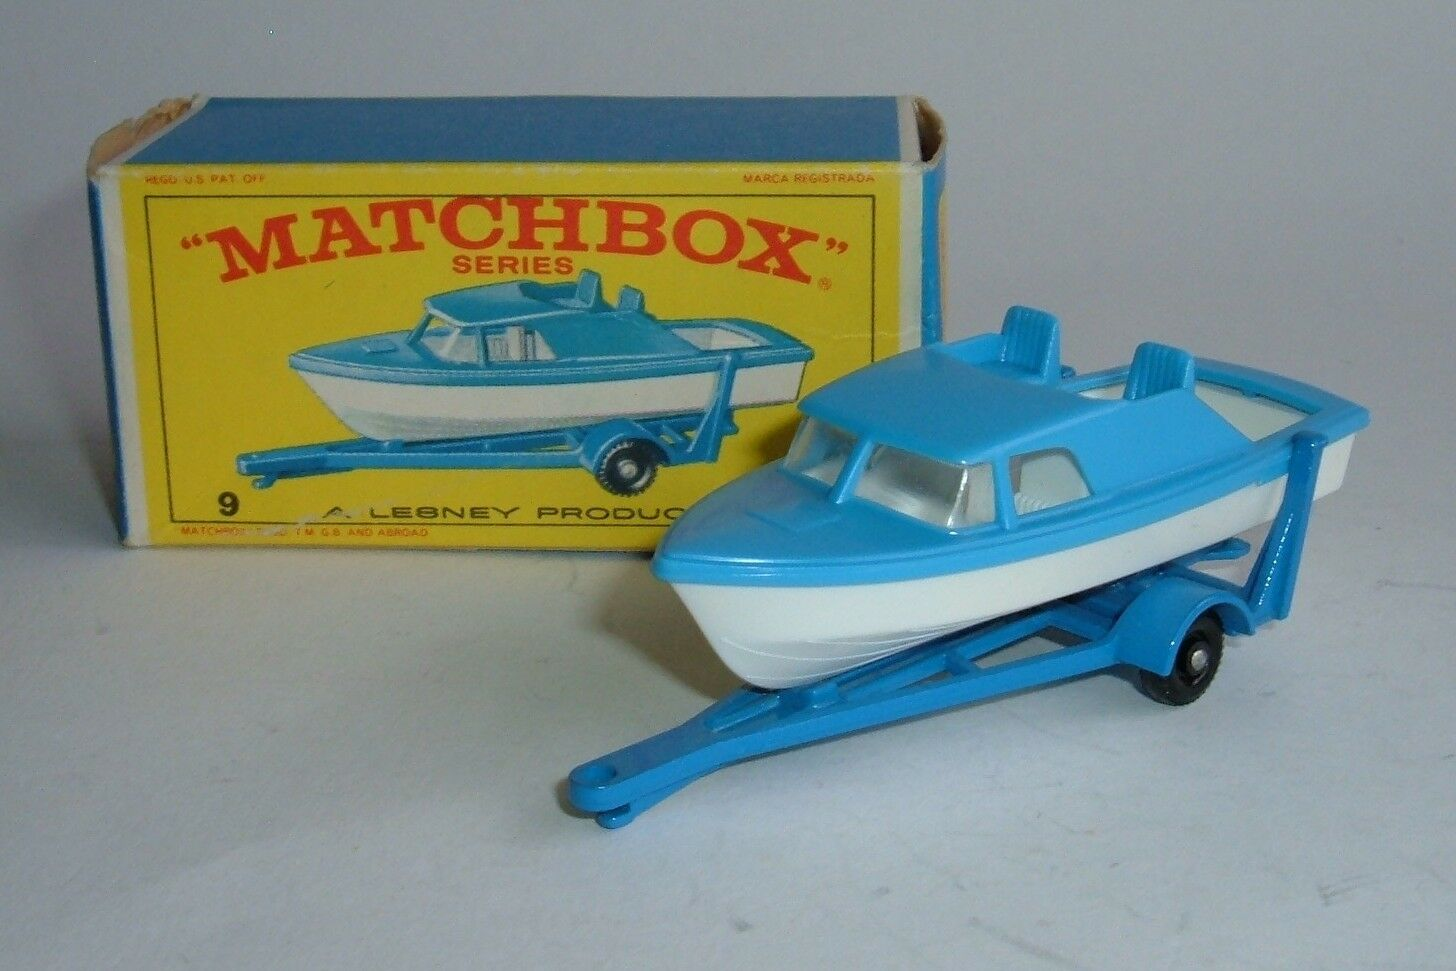 Matchbox Series No. 9, Cabin Cruiser and Trailer, - Superb Mint.